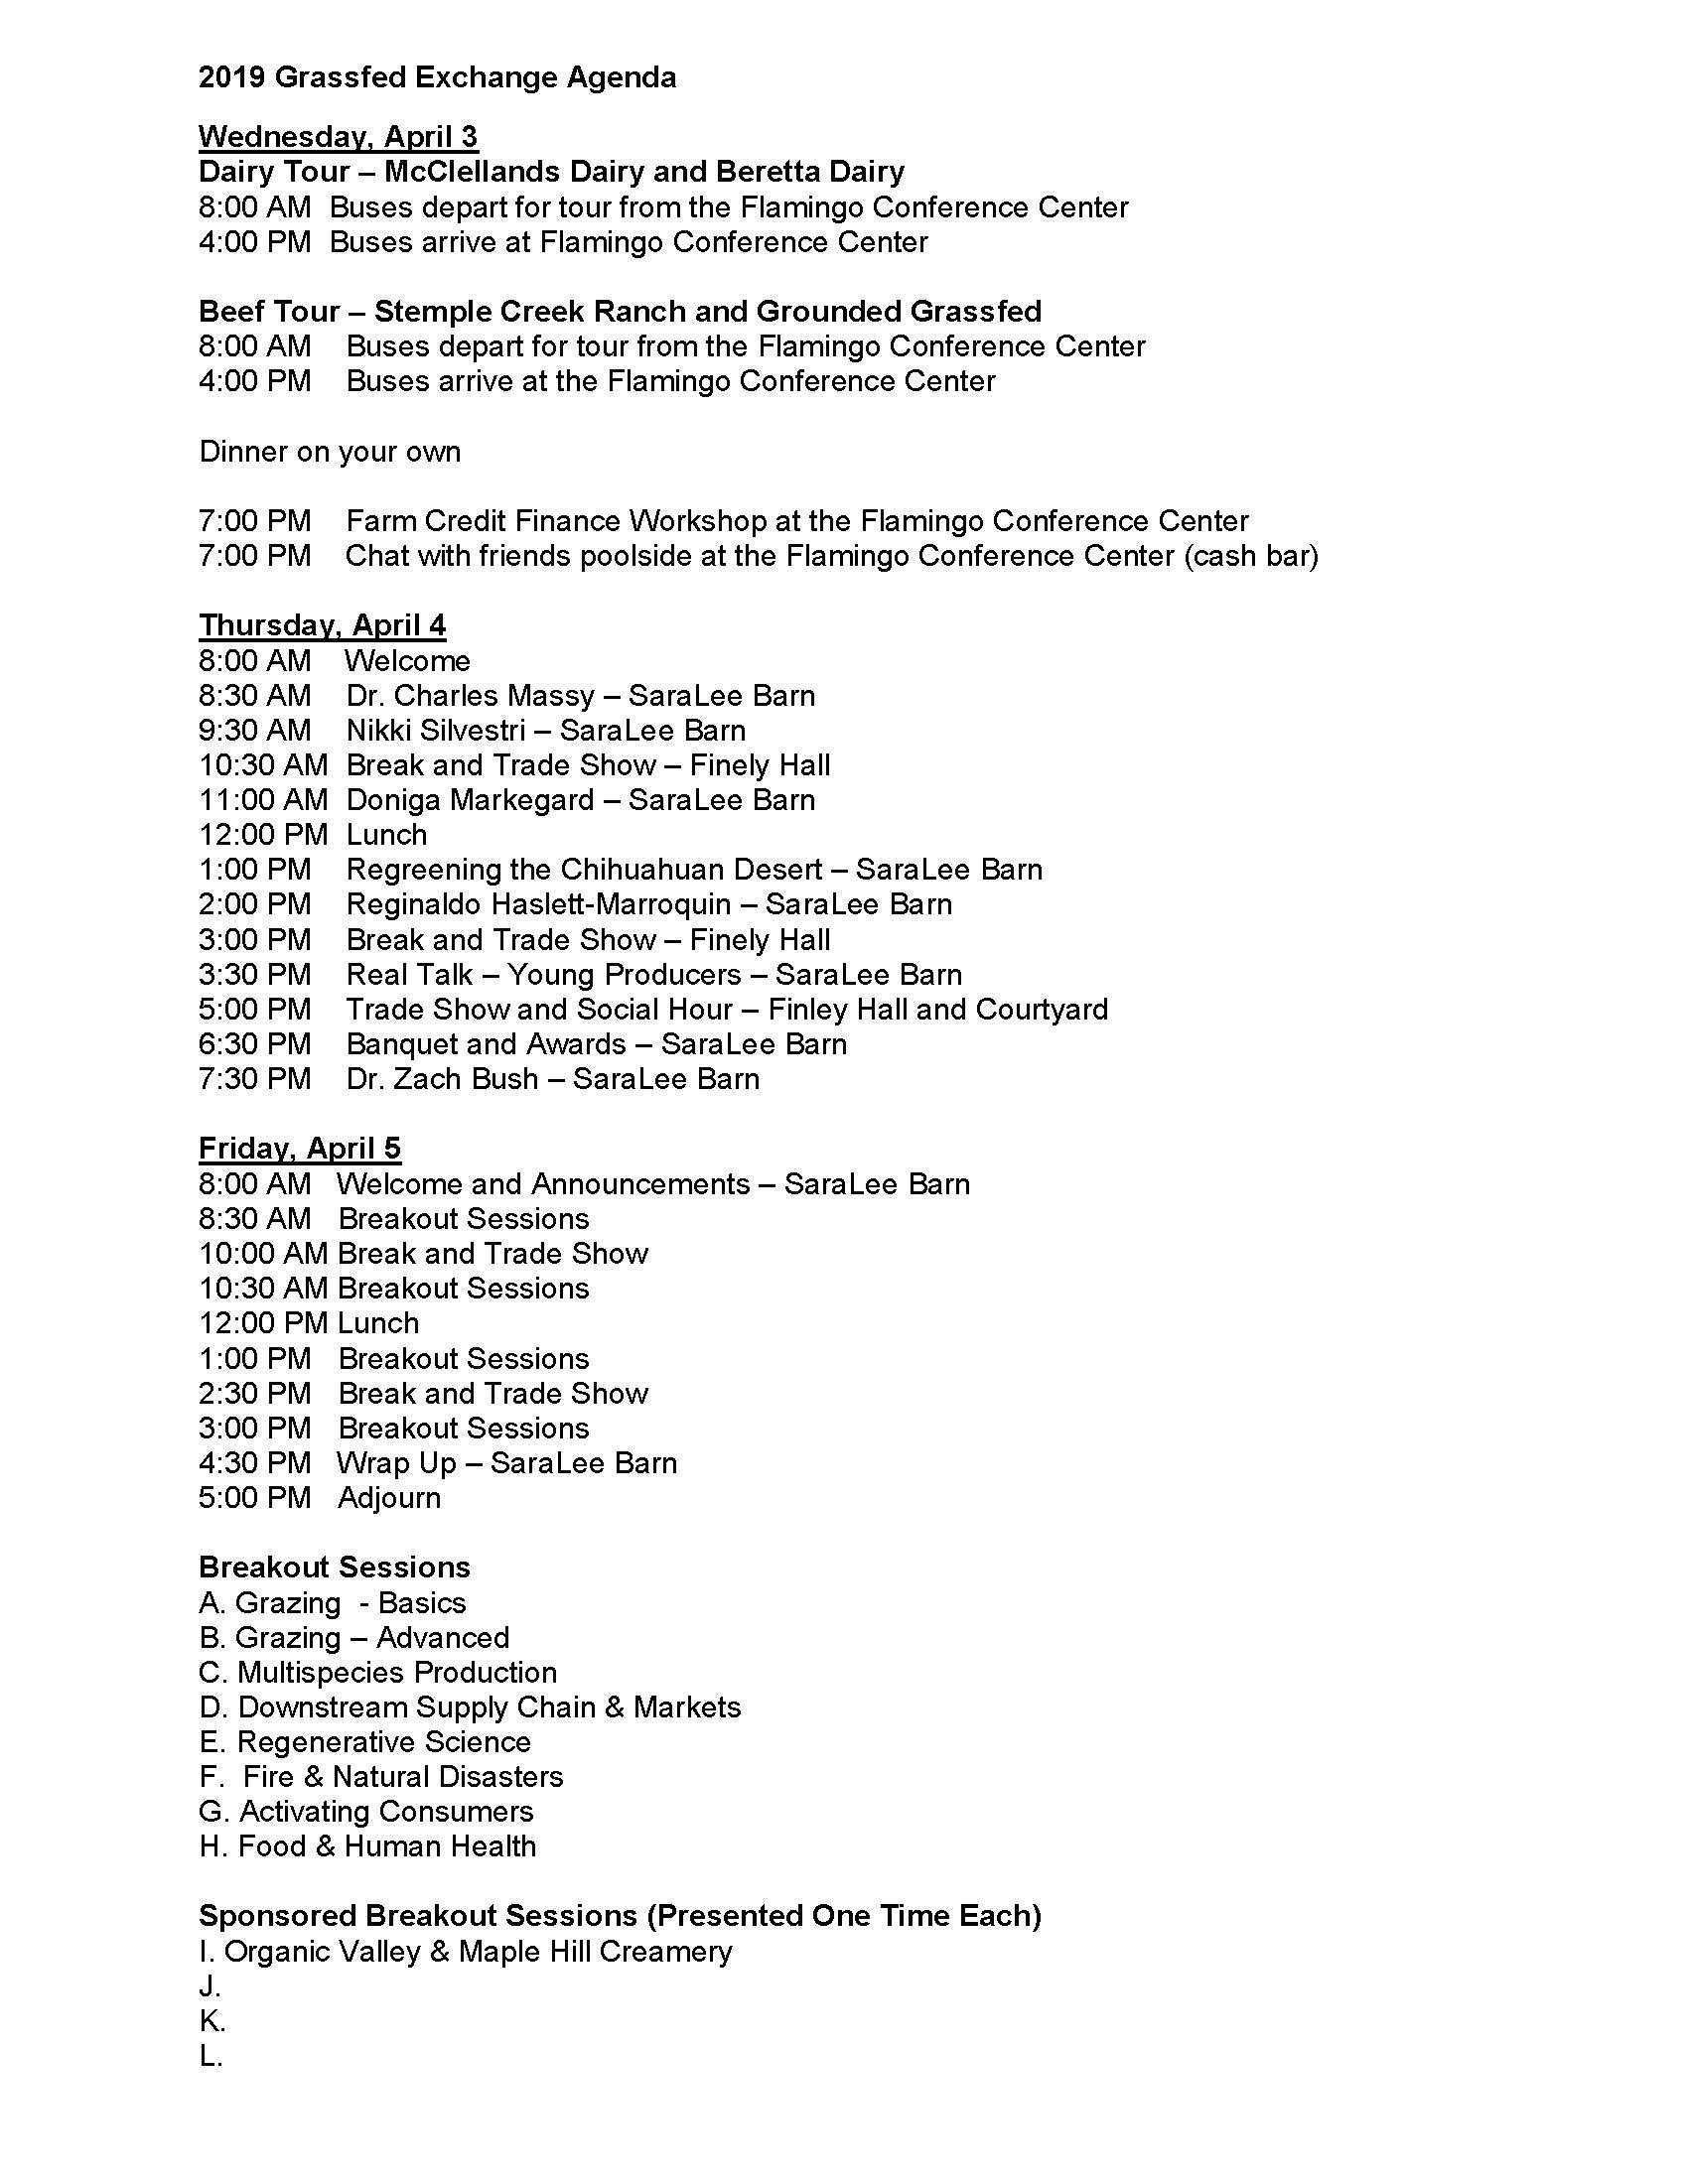 2019-GFE-Agenda_10-30-18.jpg